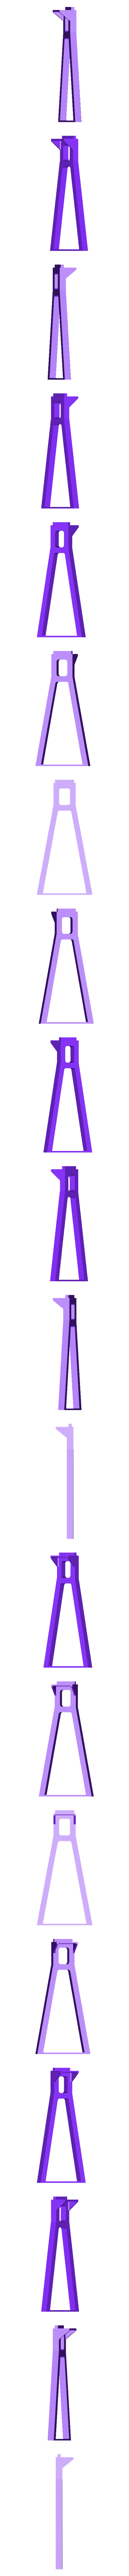 rampes scx24 pied rampe h100 45 deg.STL Download STL file AXIAL SCX24 mini or micro crawler Bridge 100 mm • Object to 3D print, lulu3Dbuilder